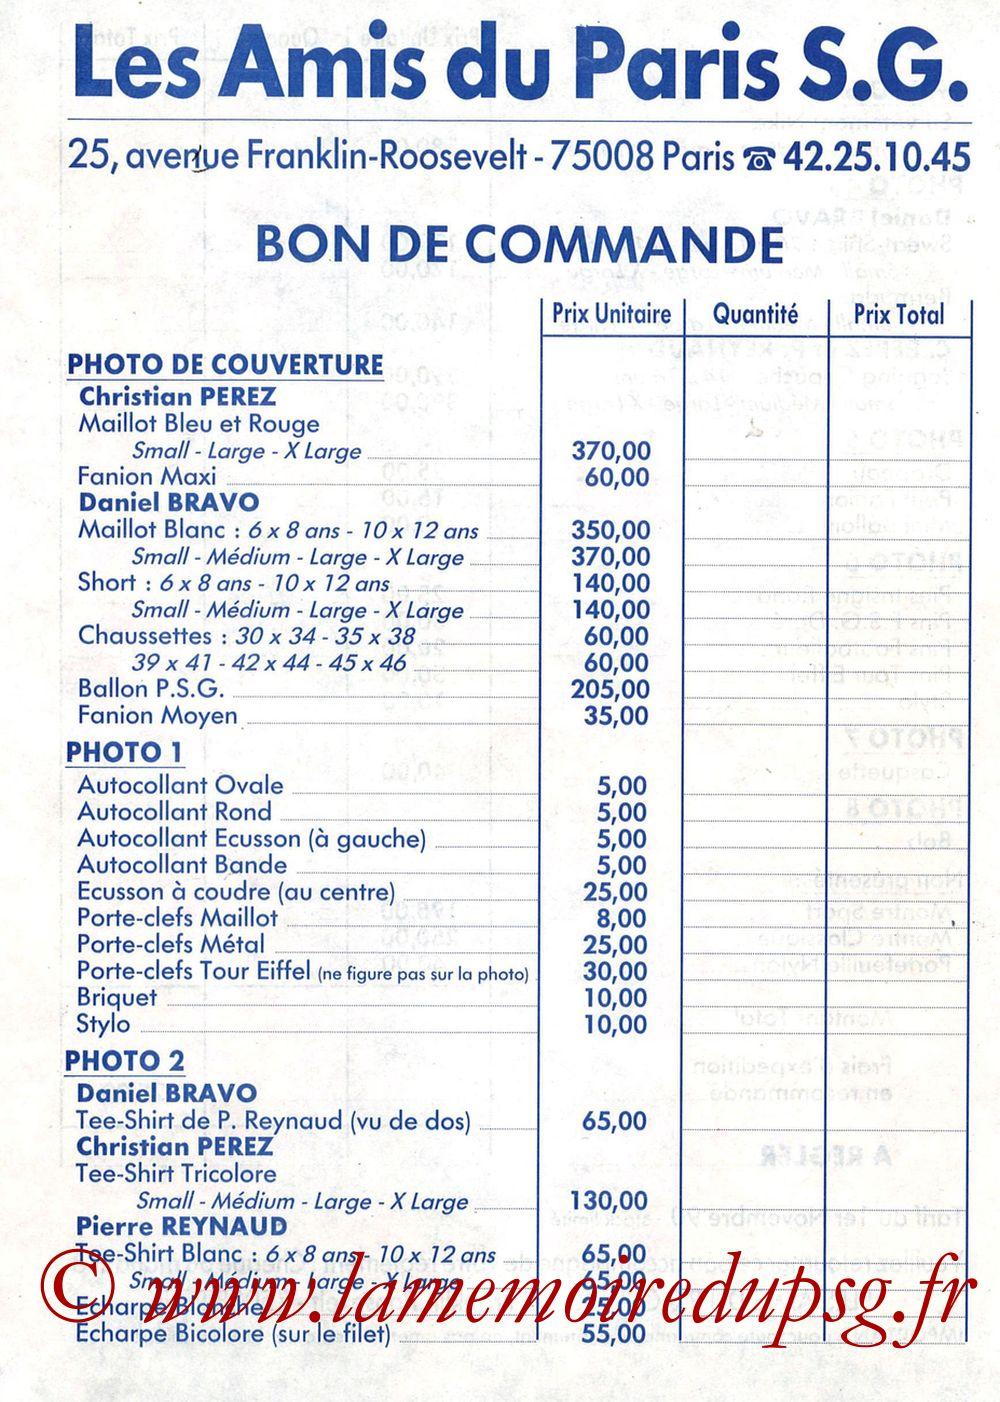 Catalogue PSG - 1990-91 - Bon de Commande Recto